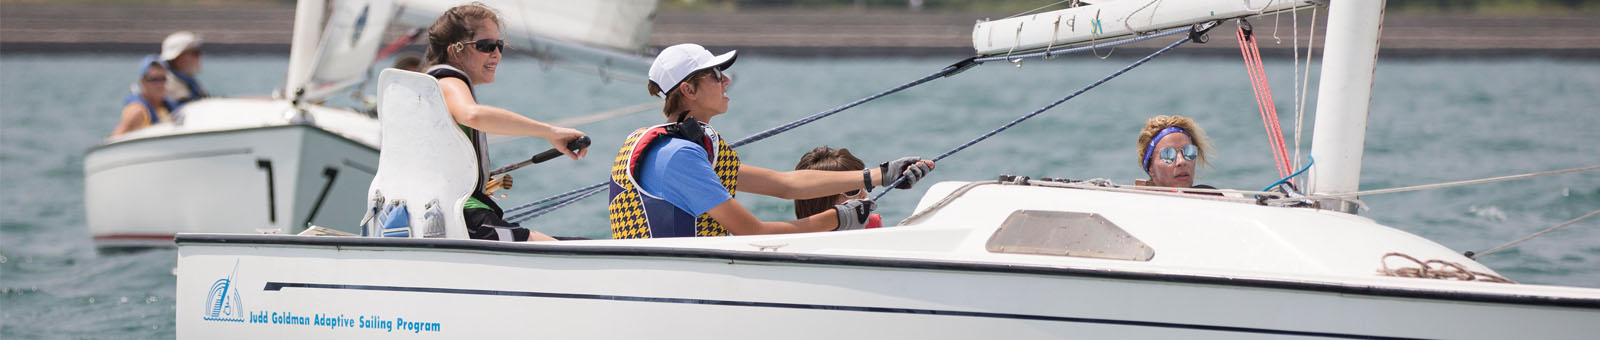 Judd Goldman Adaptive Sailing Program